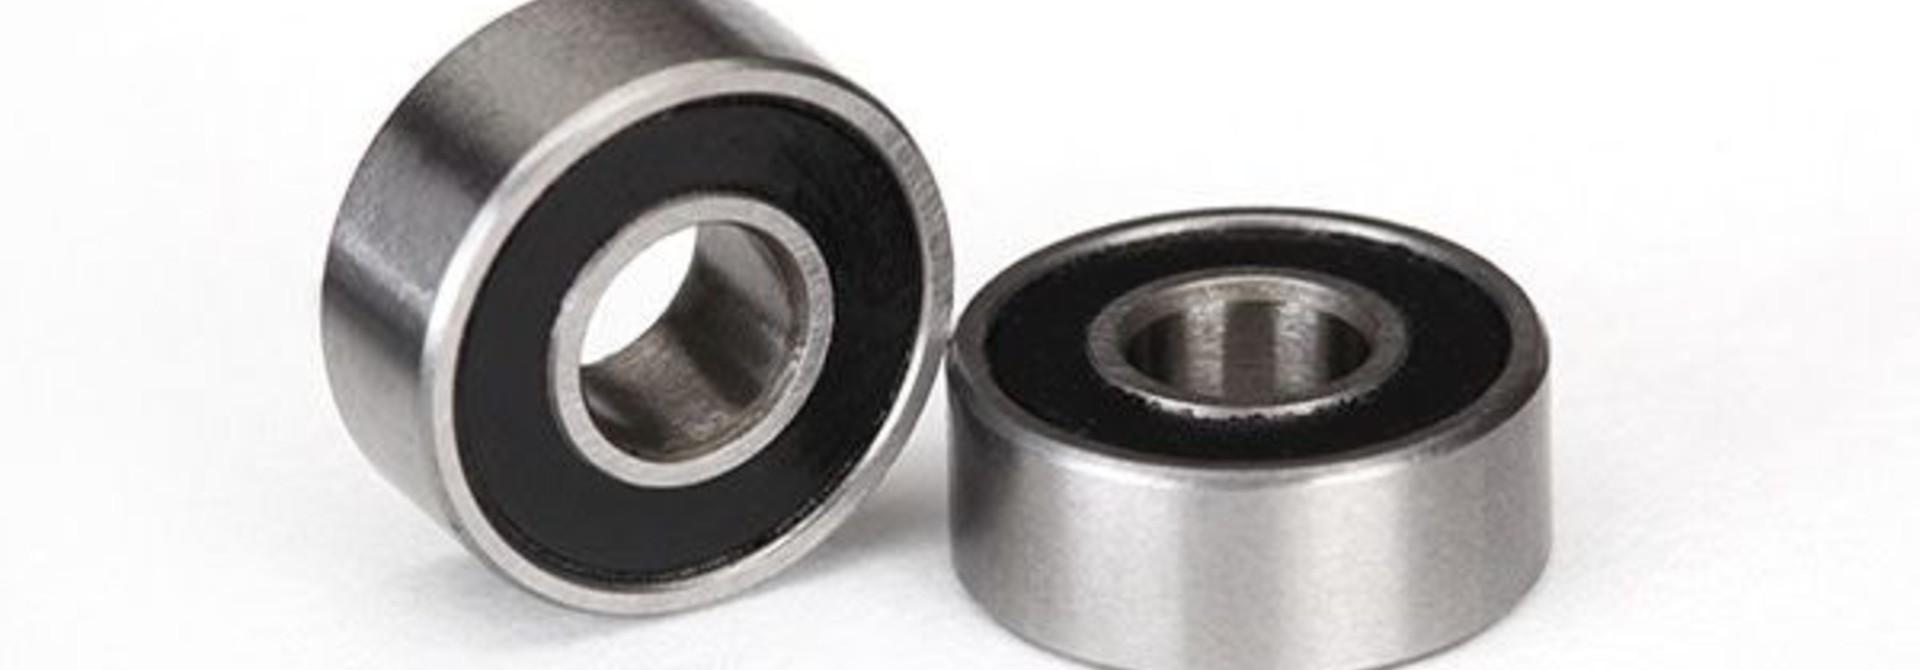 Ball bearings, black rubber sealed (4x10x4mm) (2), TRX5104A